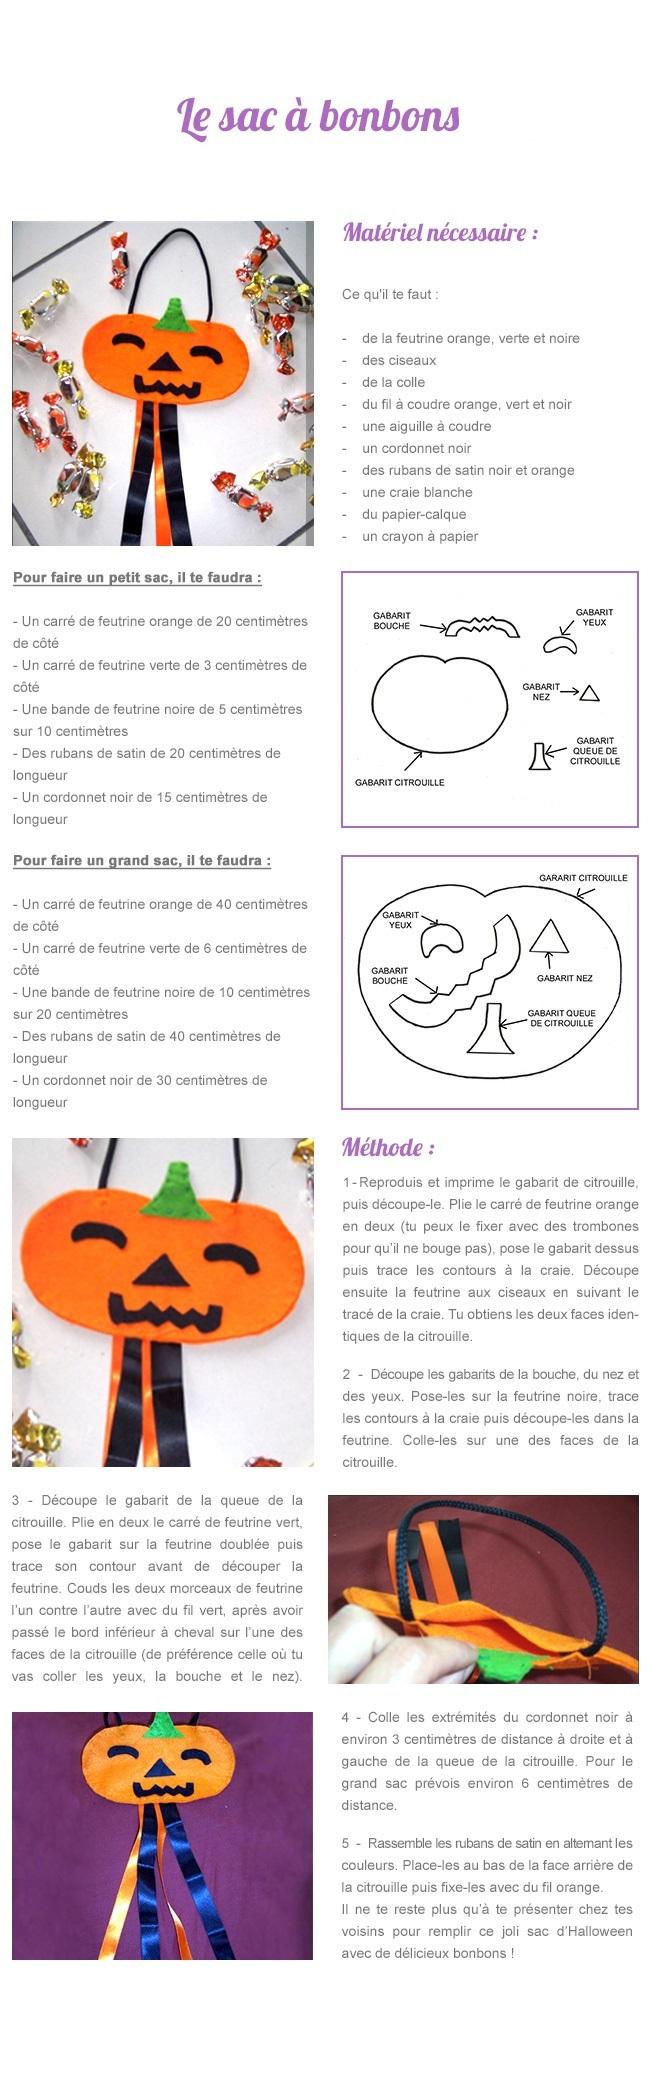 diy-sac-bonbons-halloween